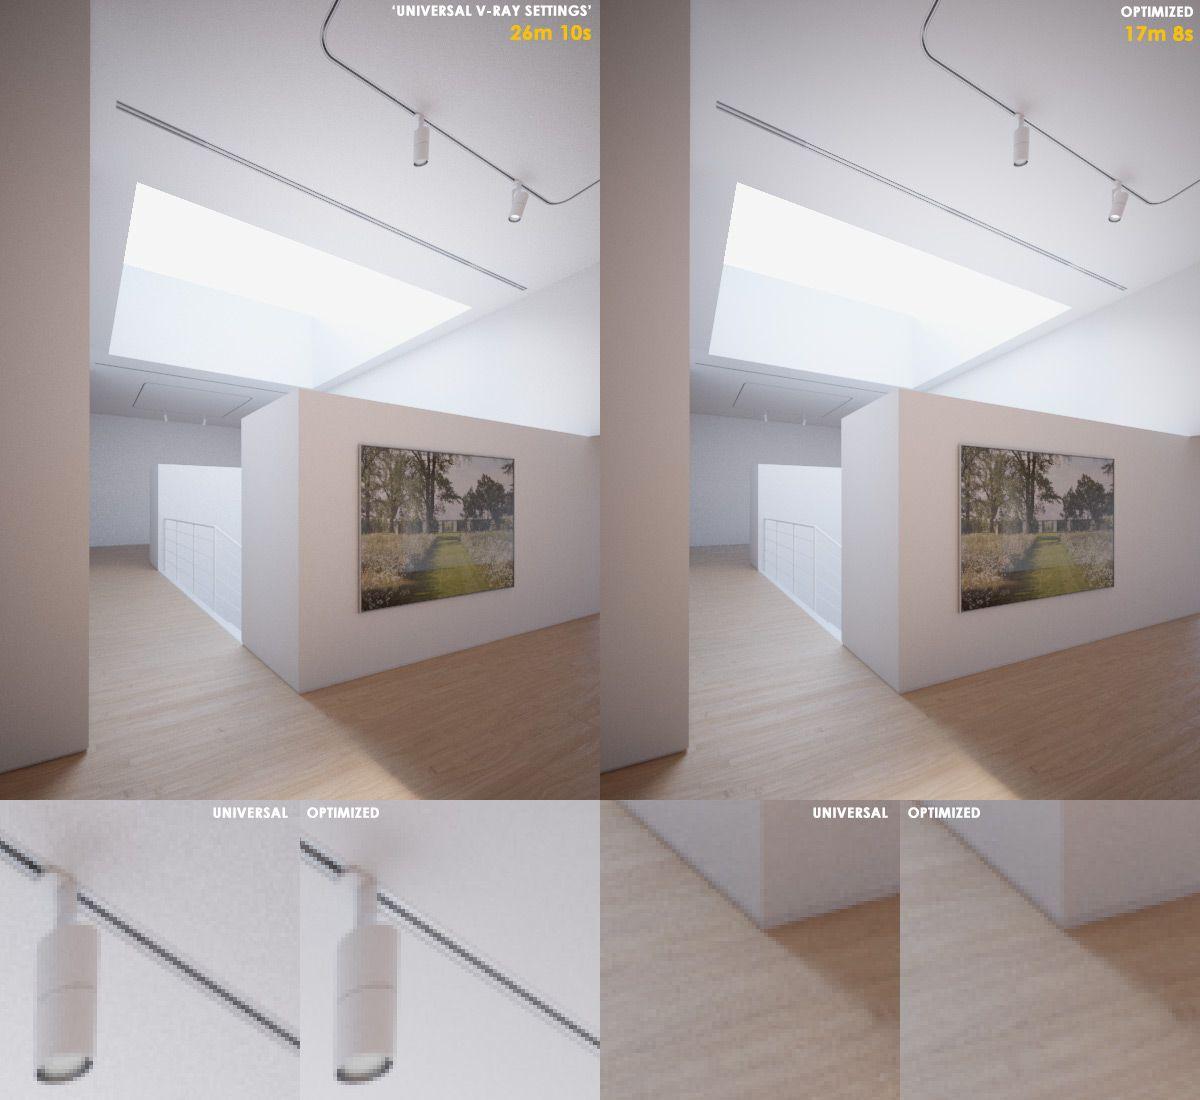 Line Drawing Render 3ds Max : V ray render optimization akin bilgic vray pinterest